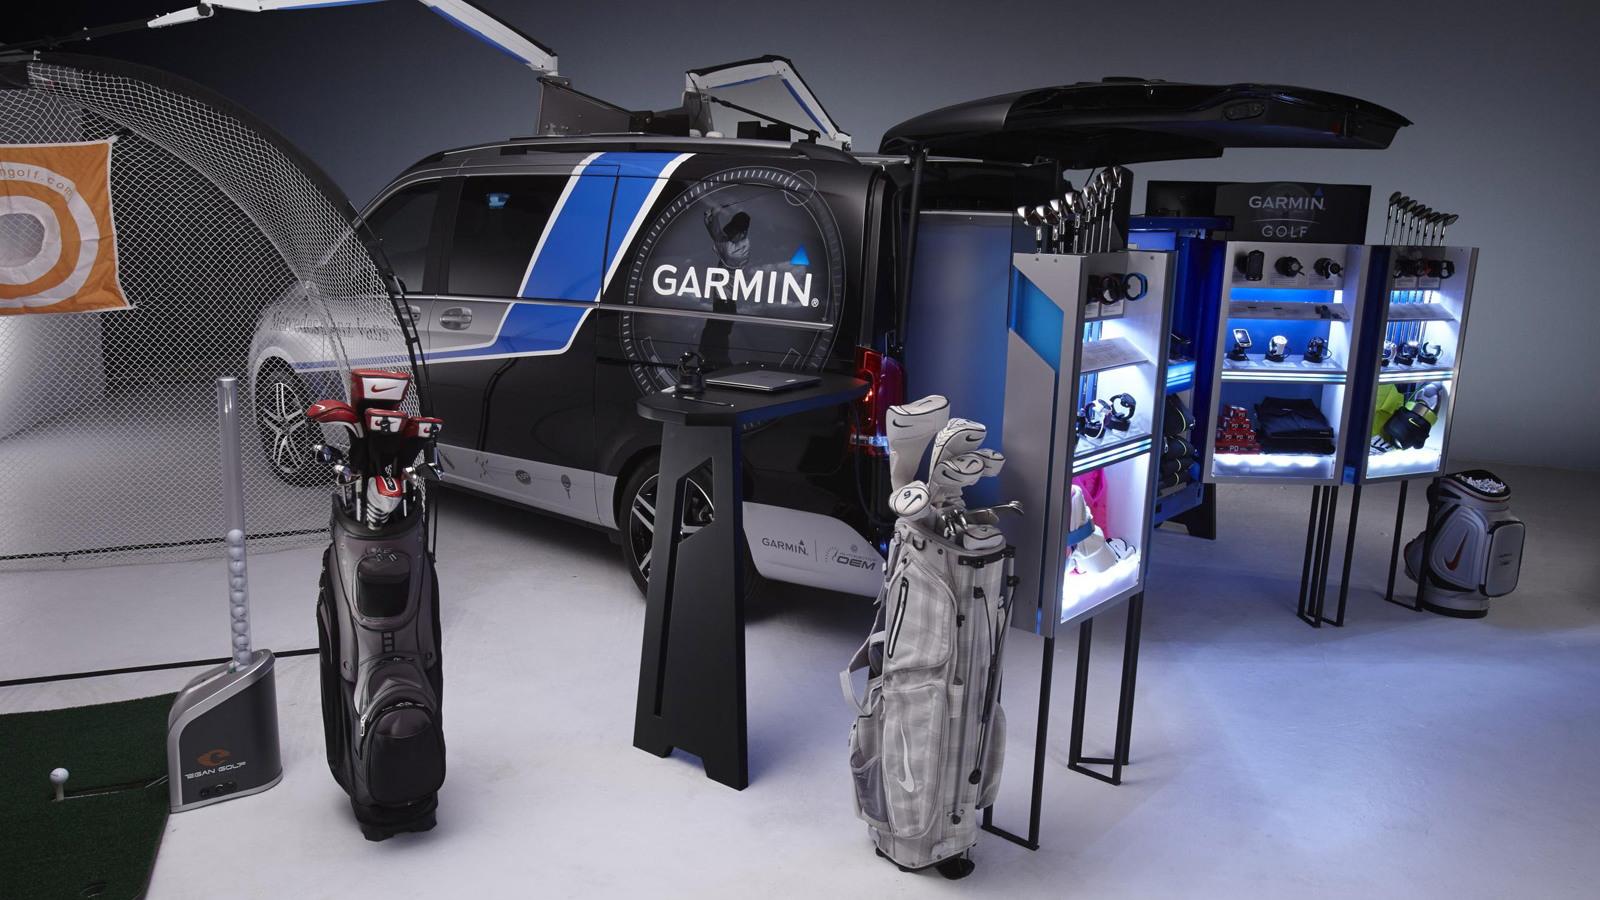 Mercedes-Benz Metris Mobile Golf Pro Shop by Garmin, 2014 SEMA show